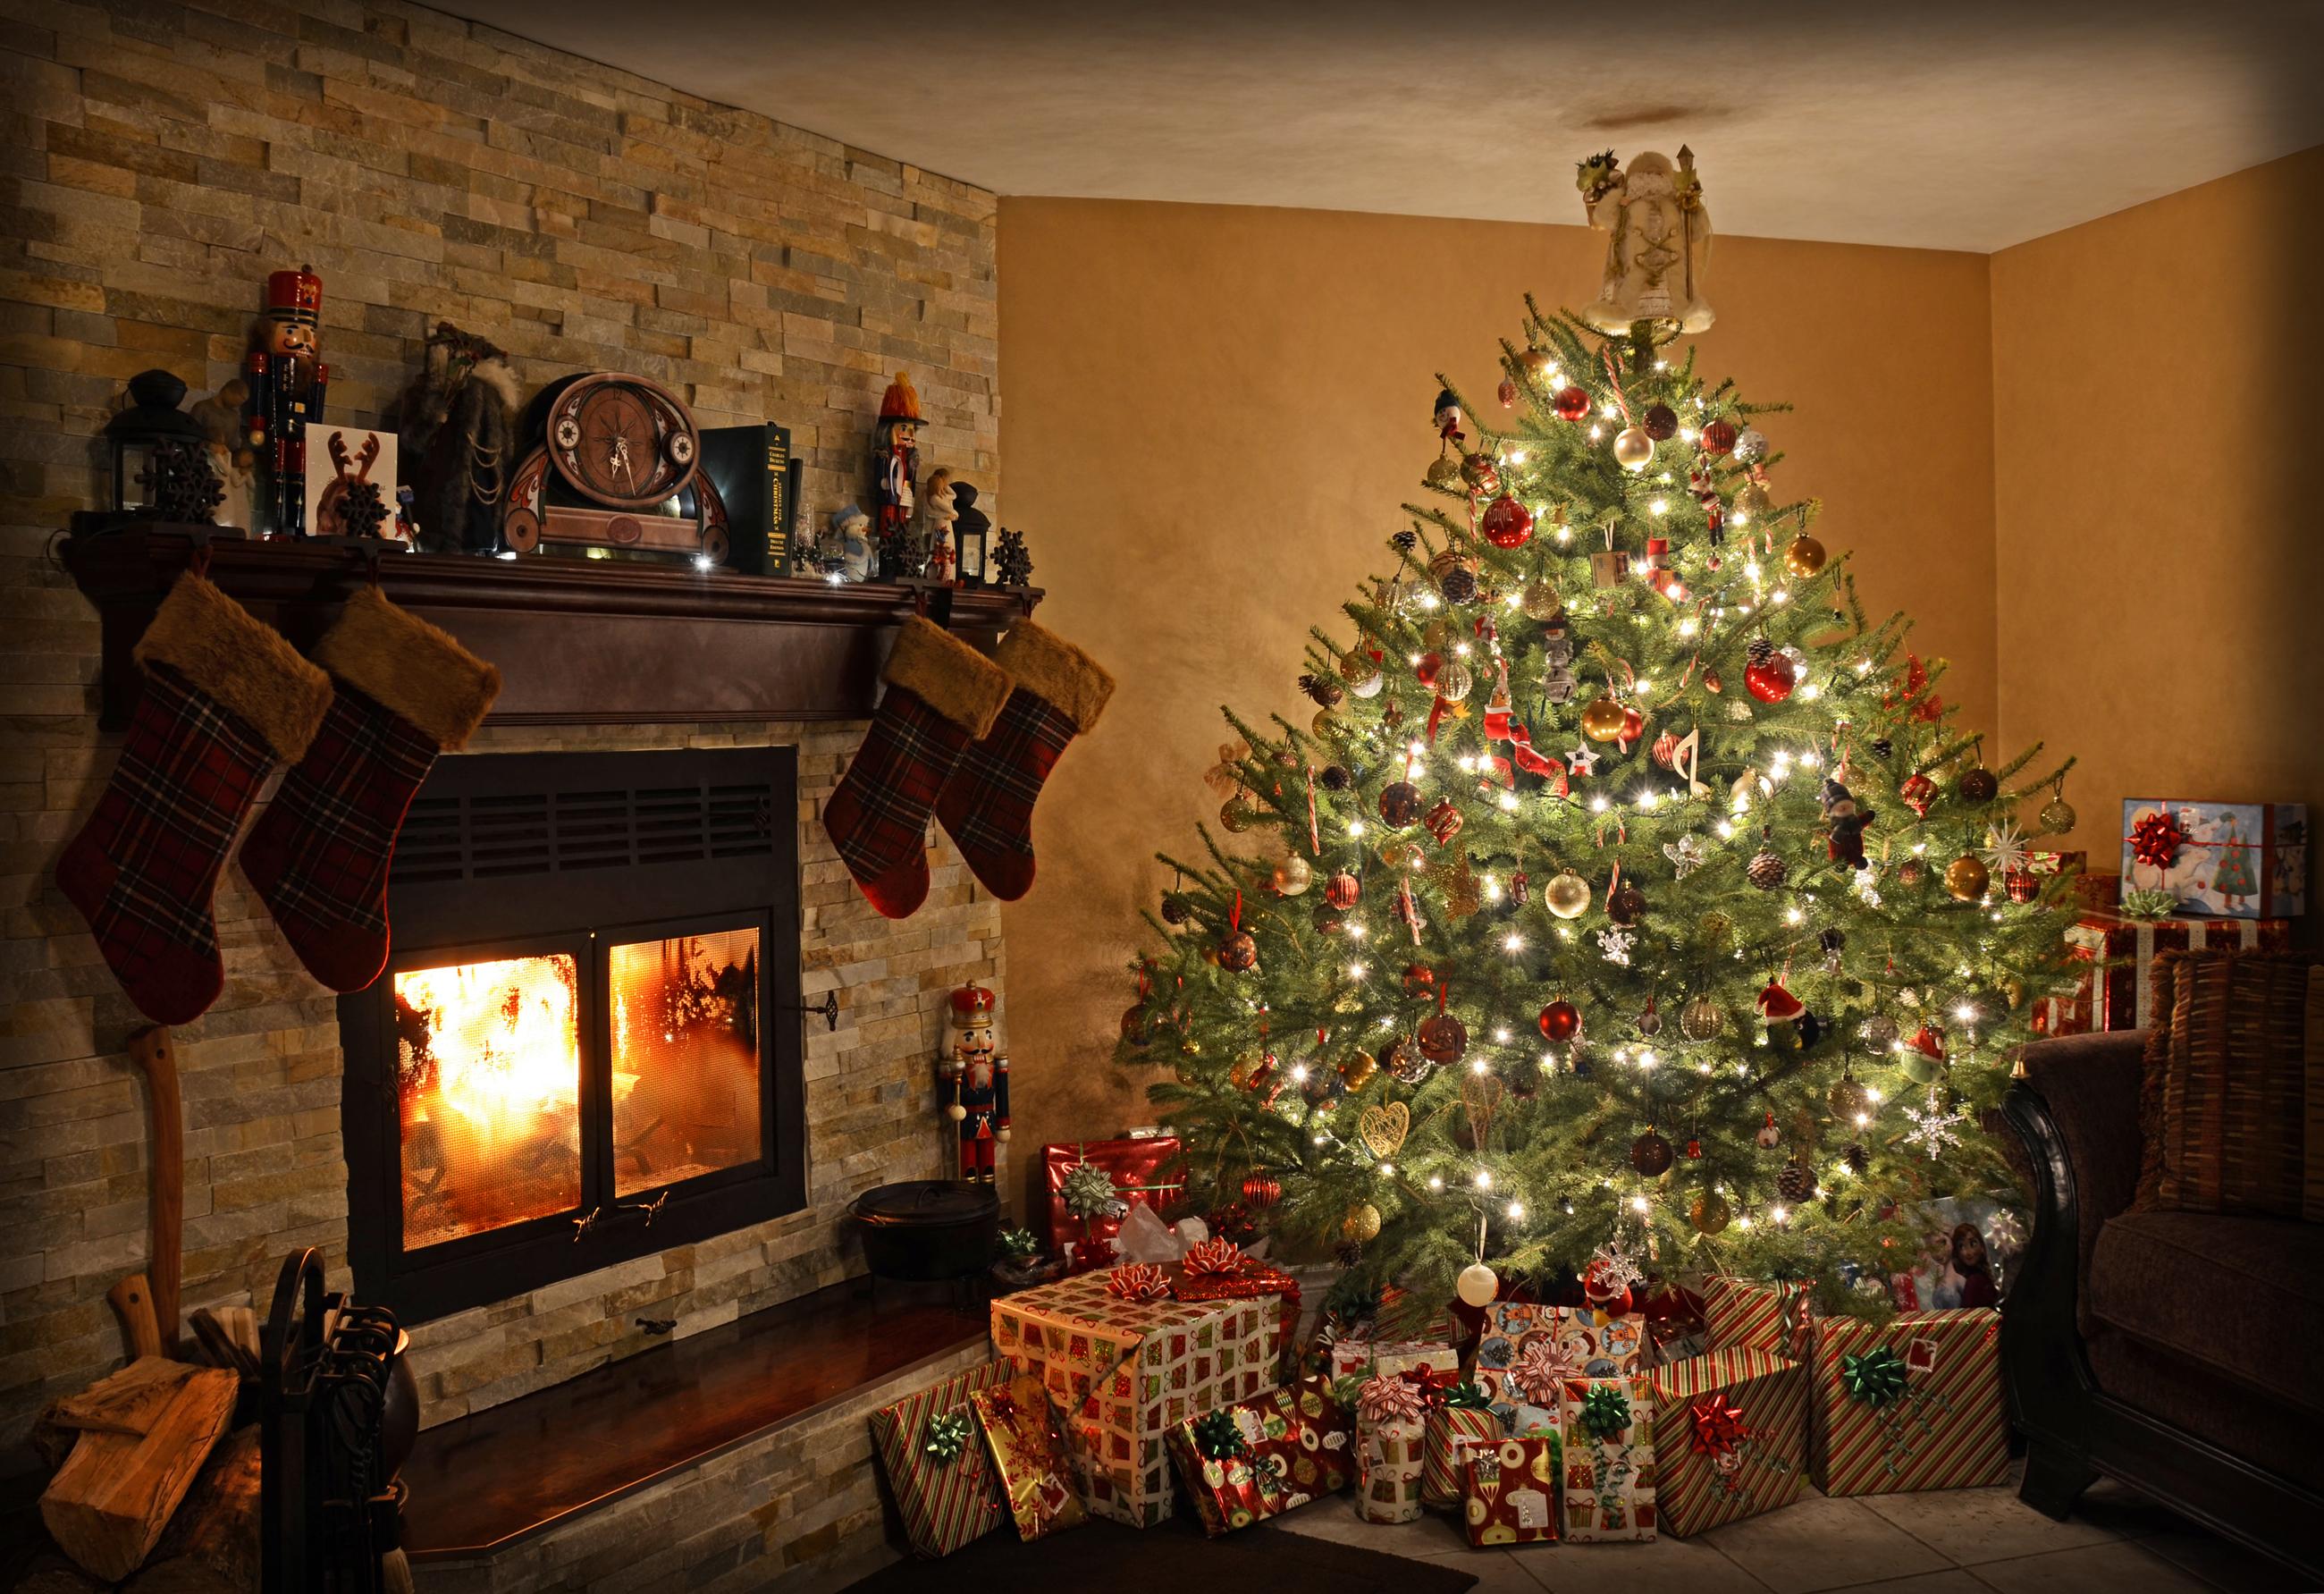 Cozy Fireplace Wallpaper 1440x900